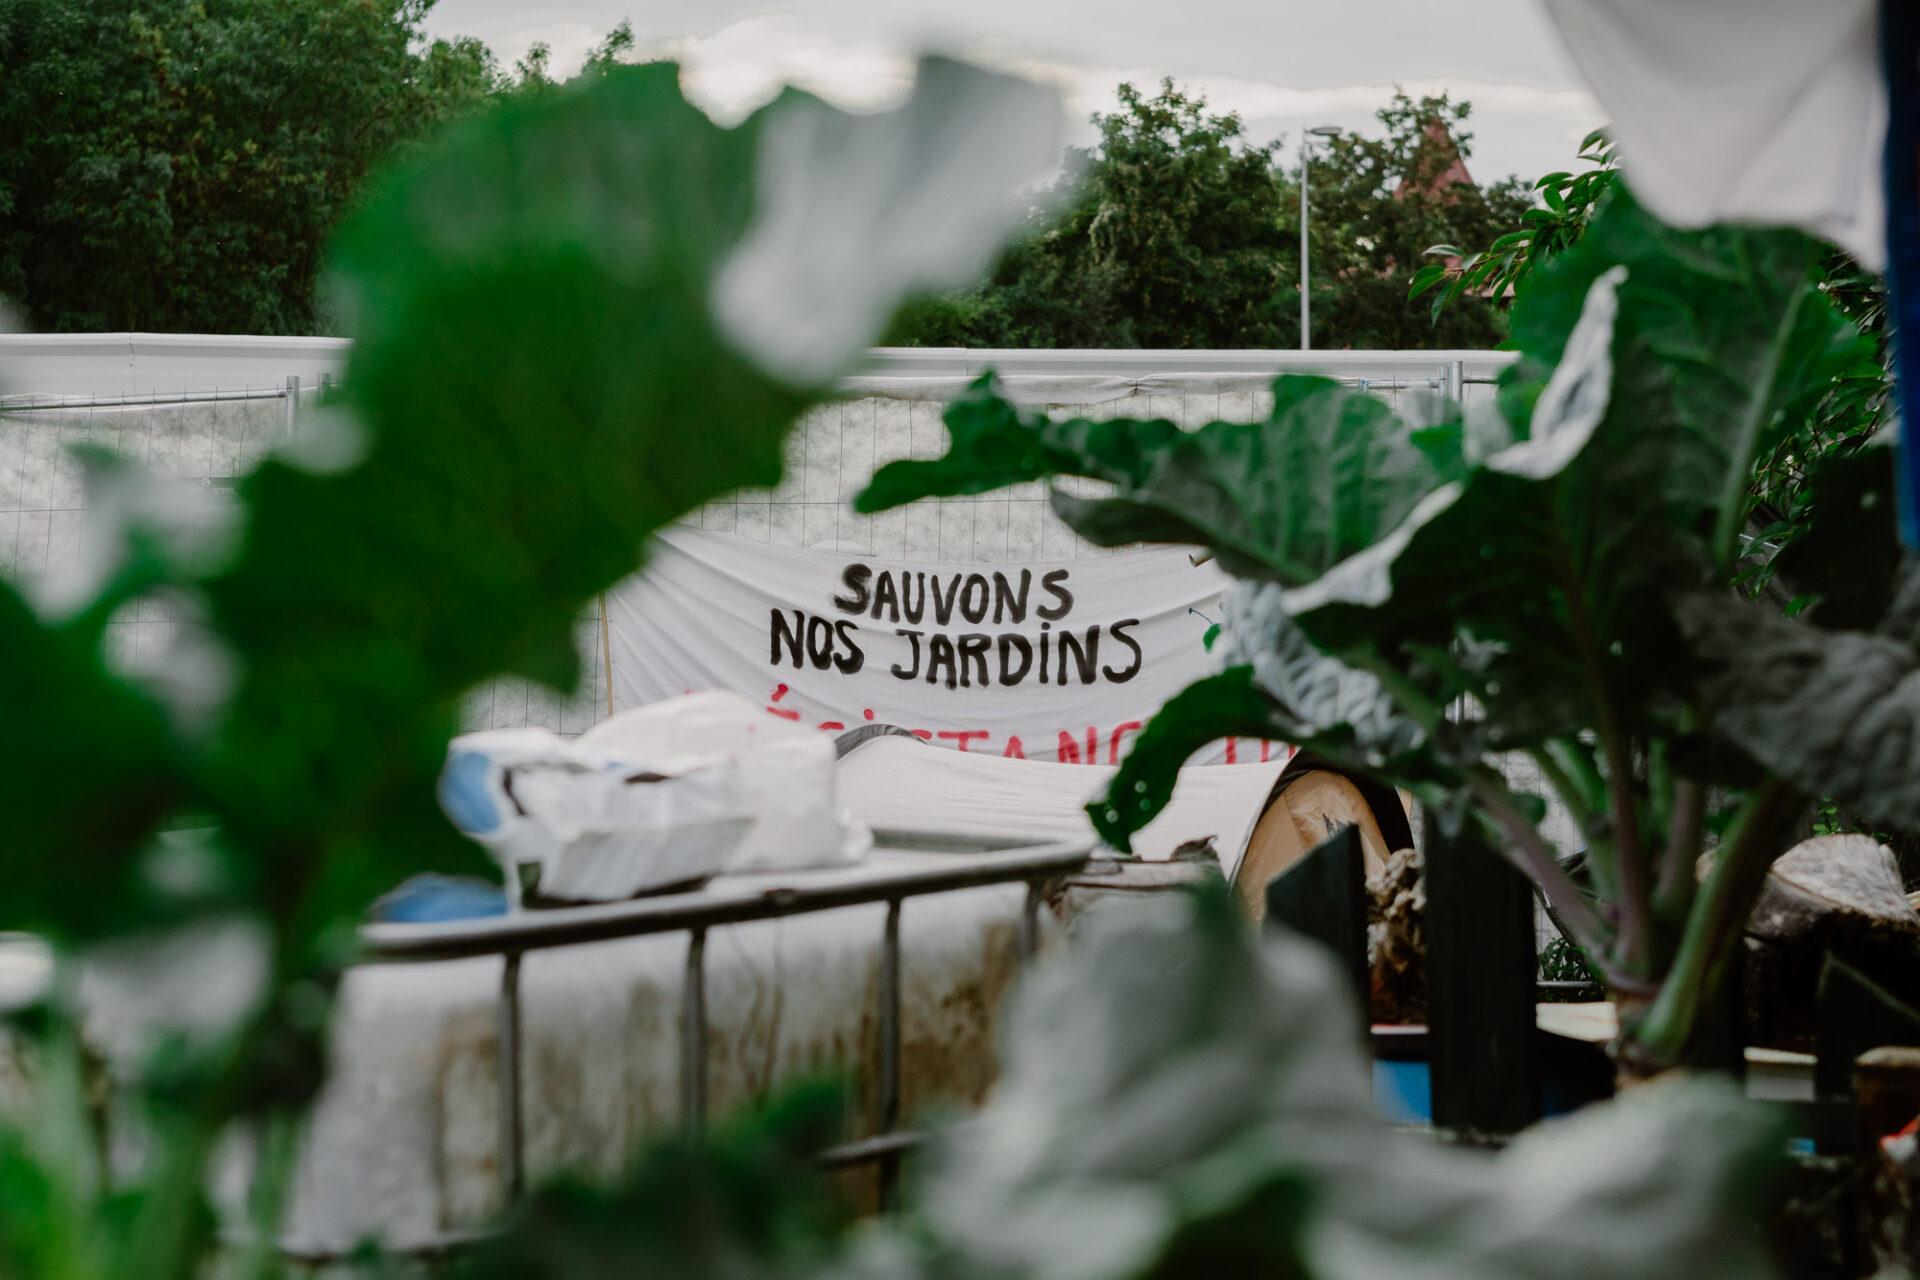 Jardins ouvriers aubervilliers 22 - Dagmara Bojenko - Eco-conscious Weddings, Births & Families